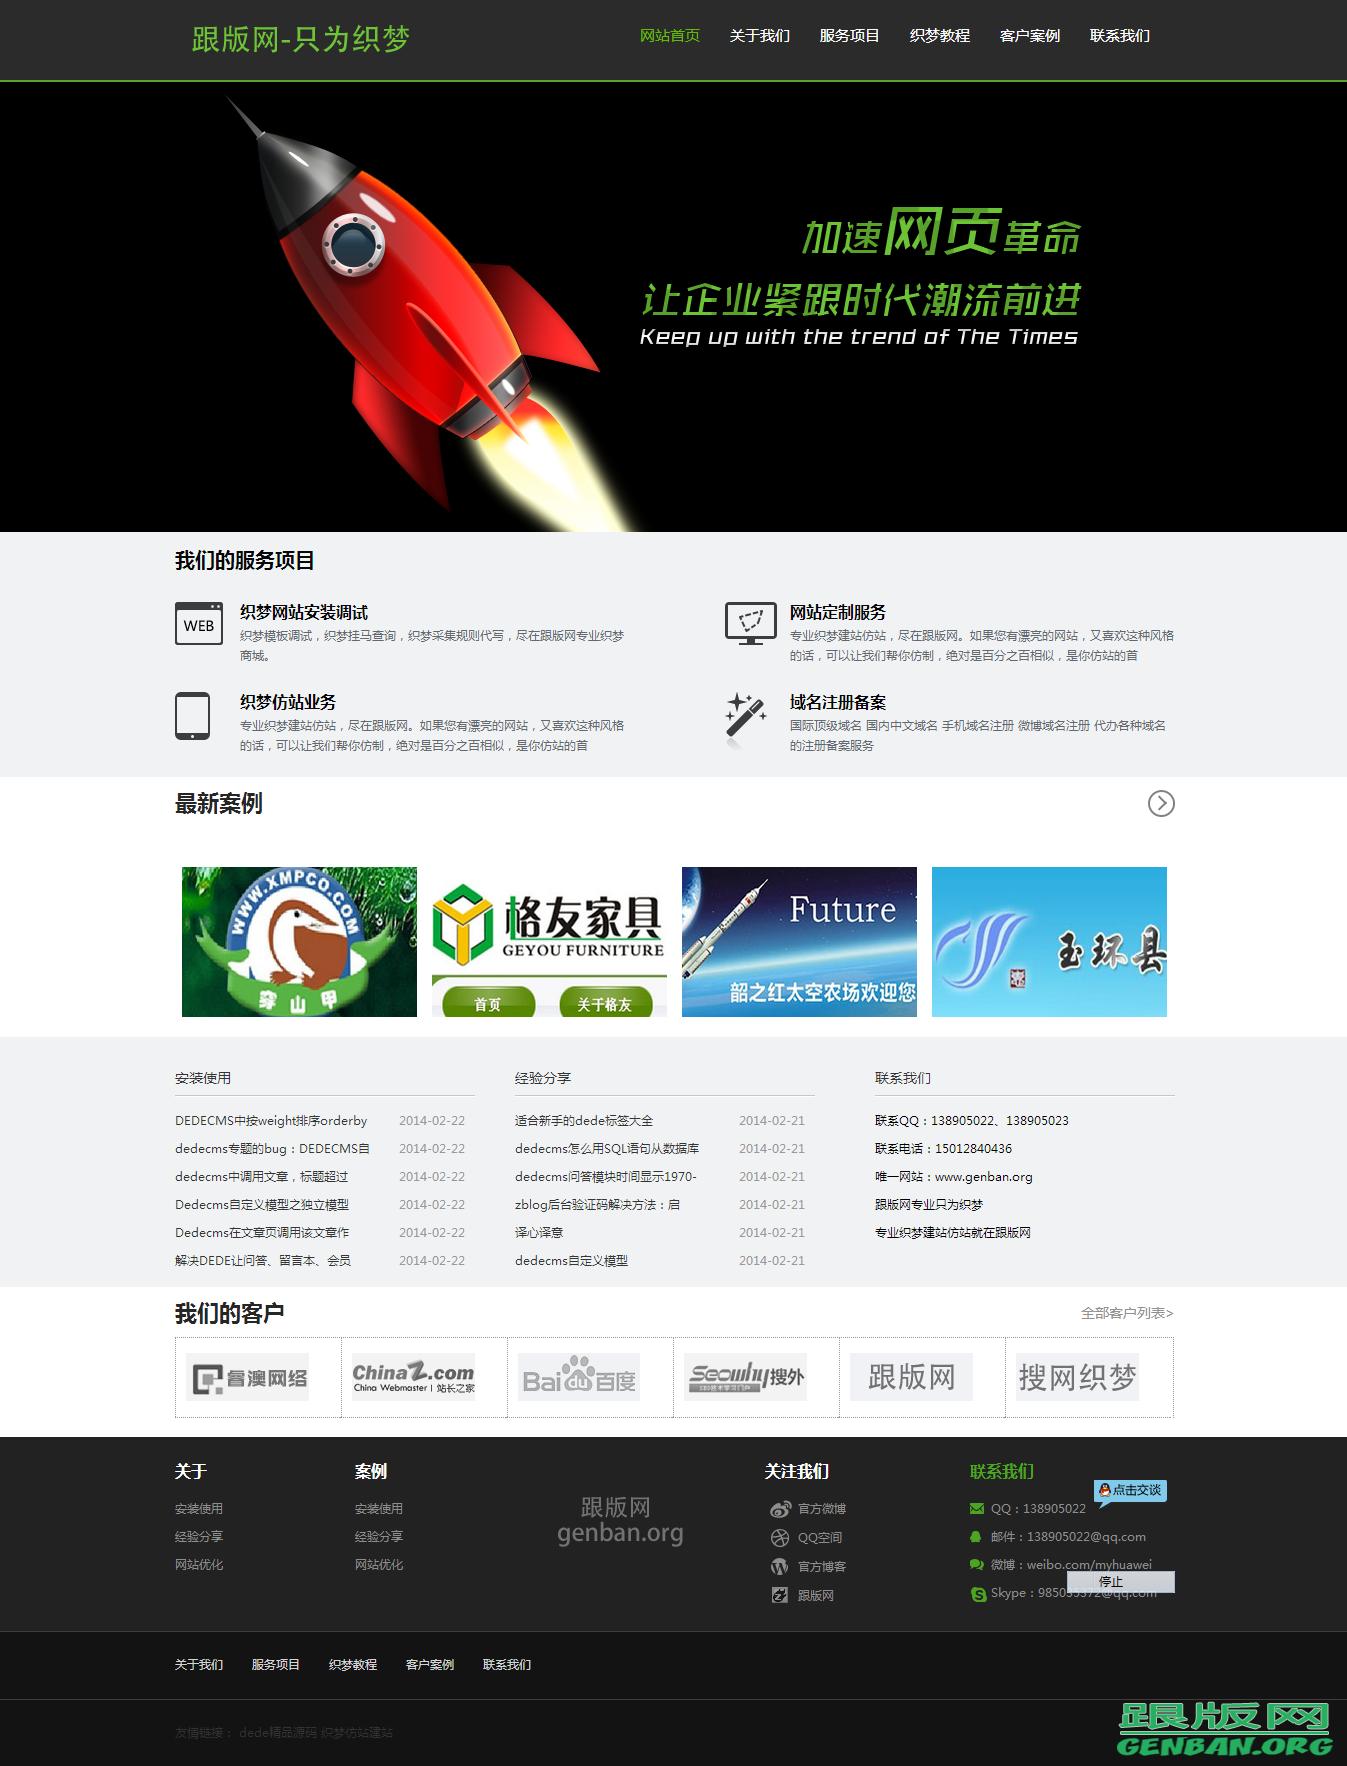 dedecms网络科技建站公司网站源码